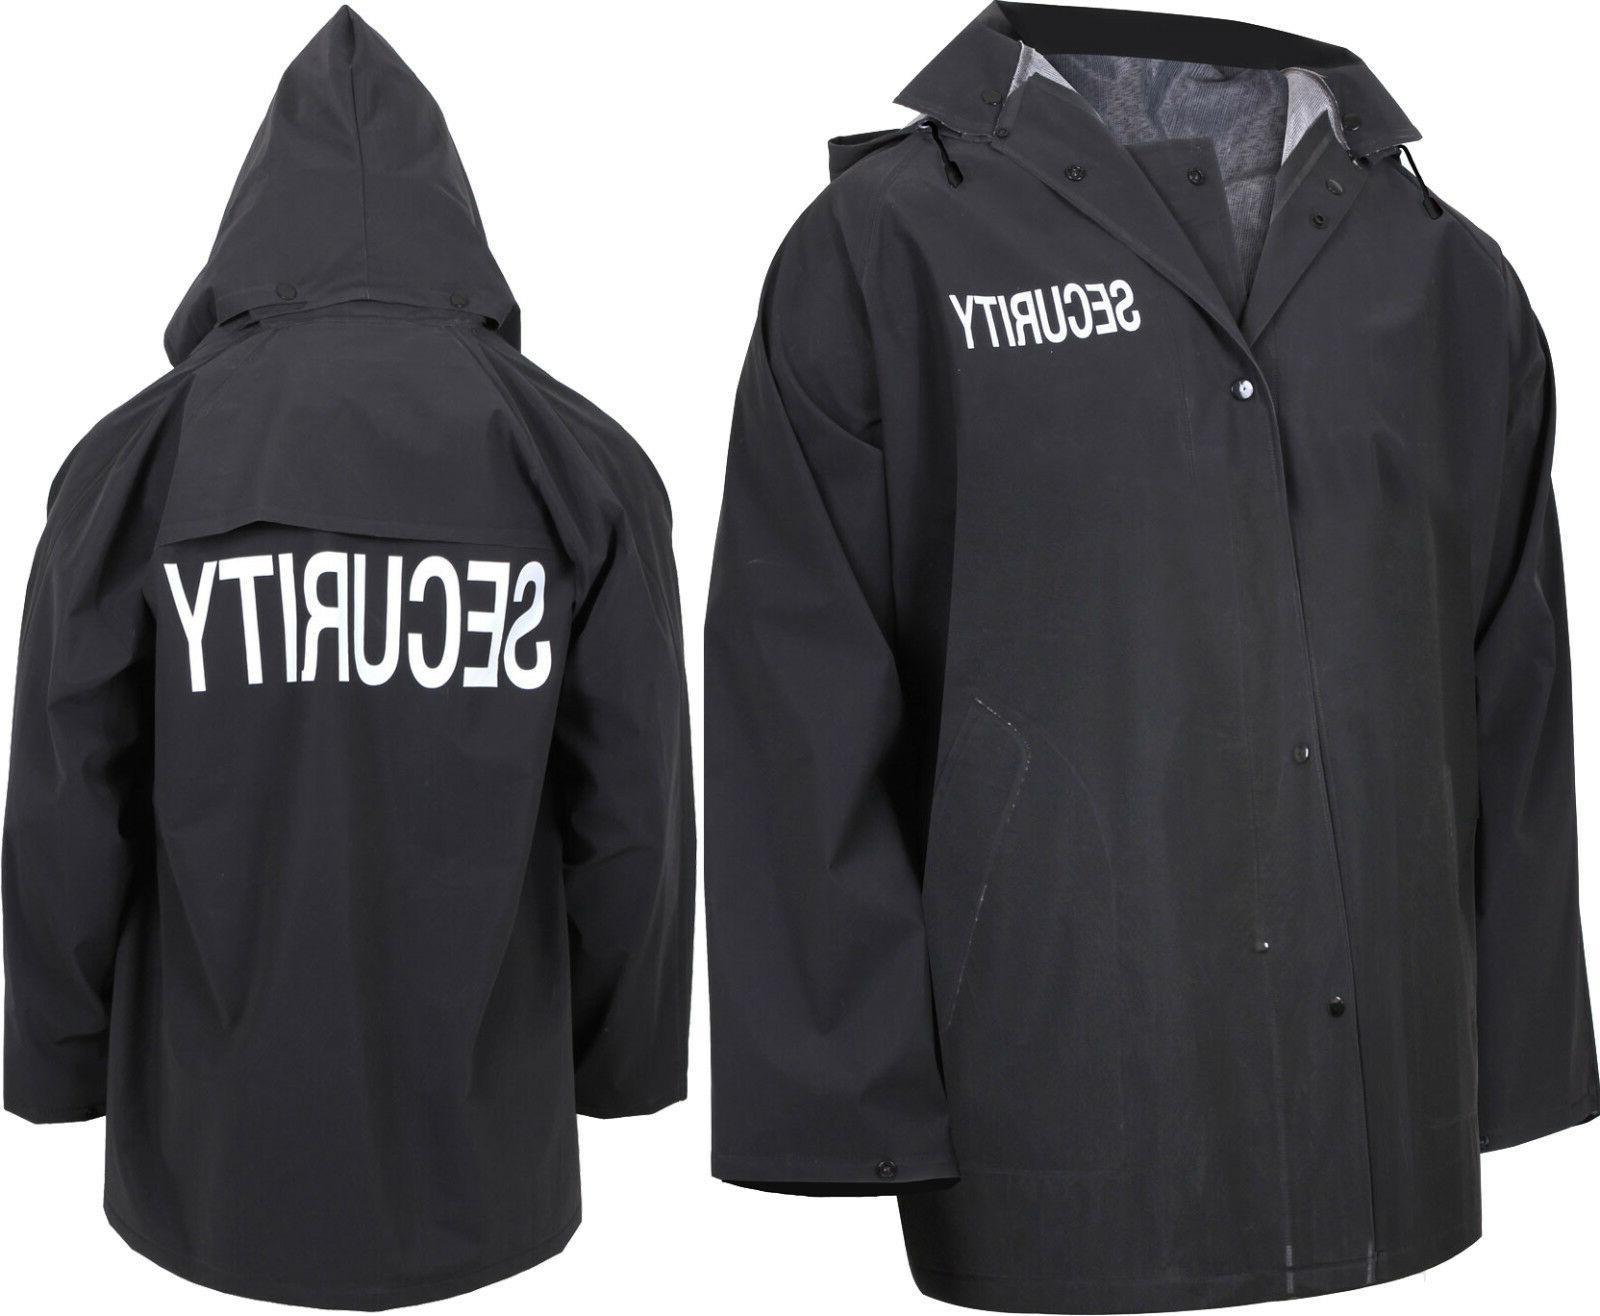 black double sided waterproof security hooded rain